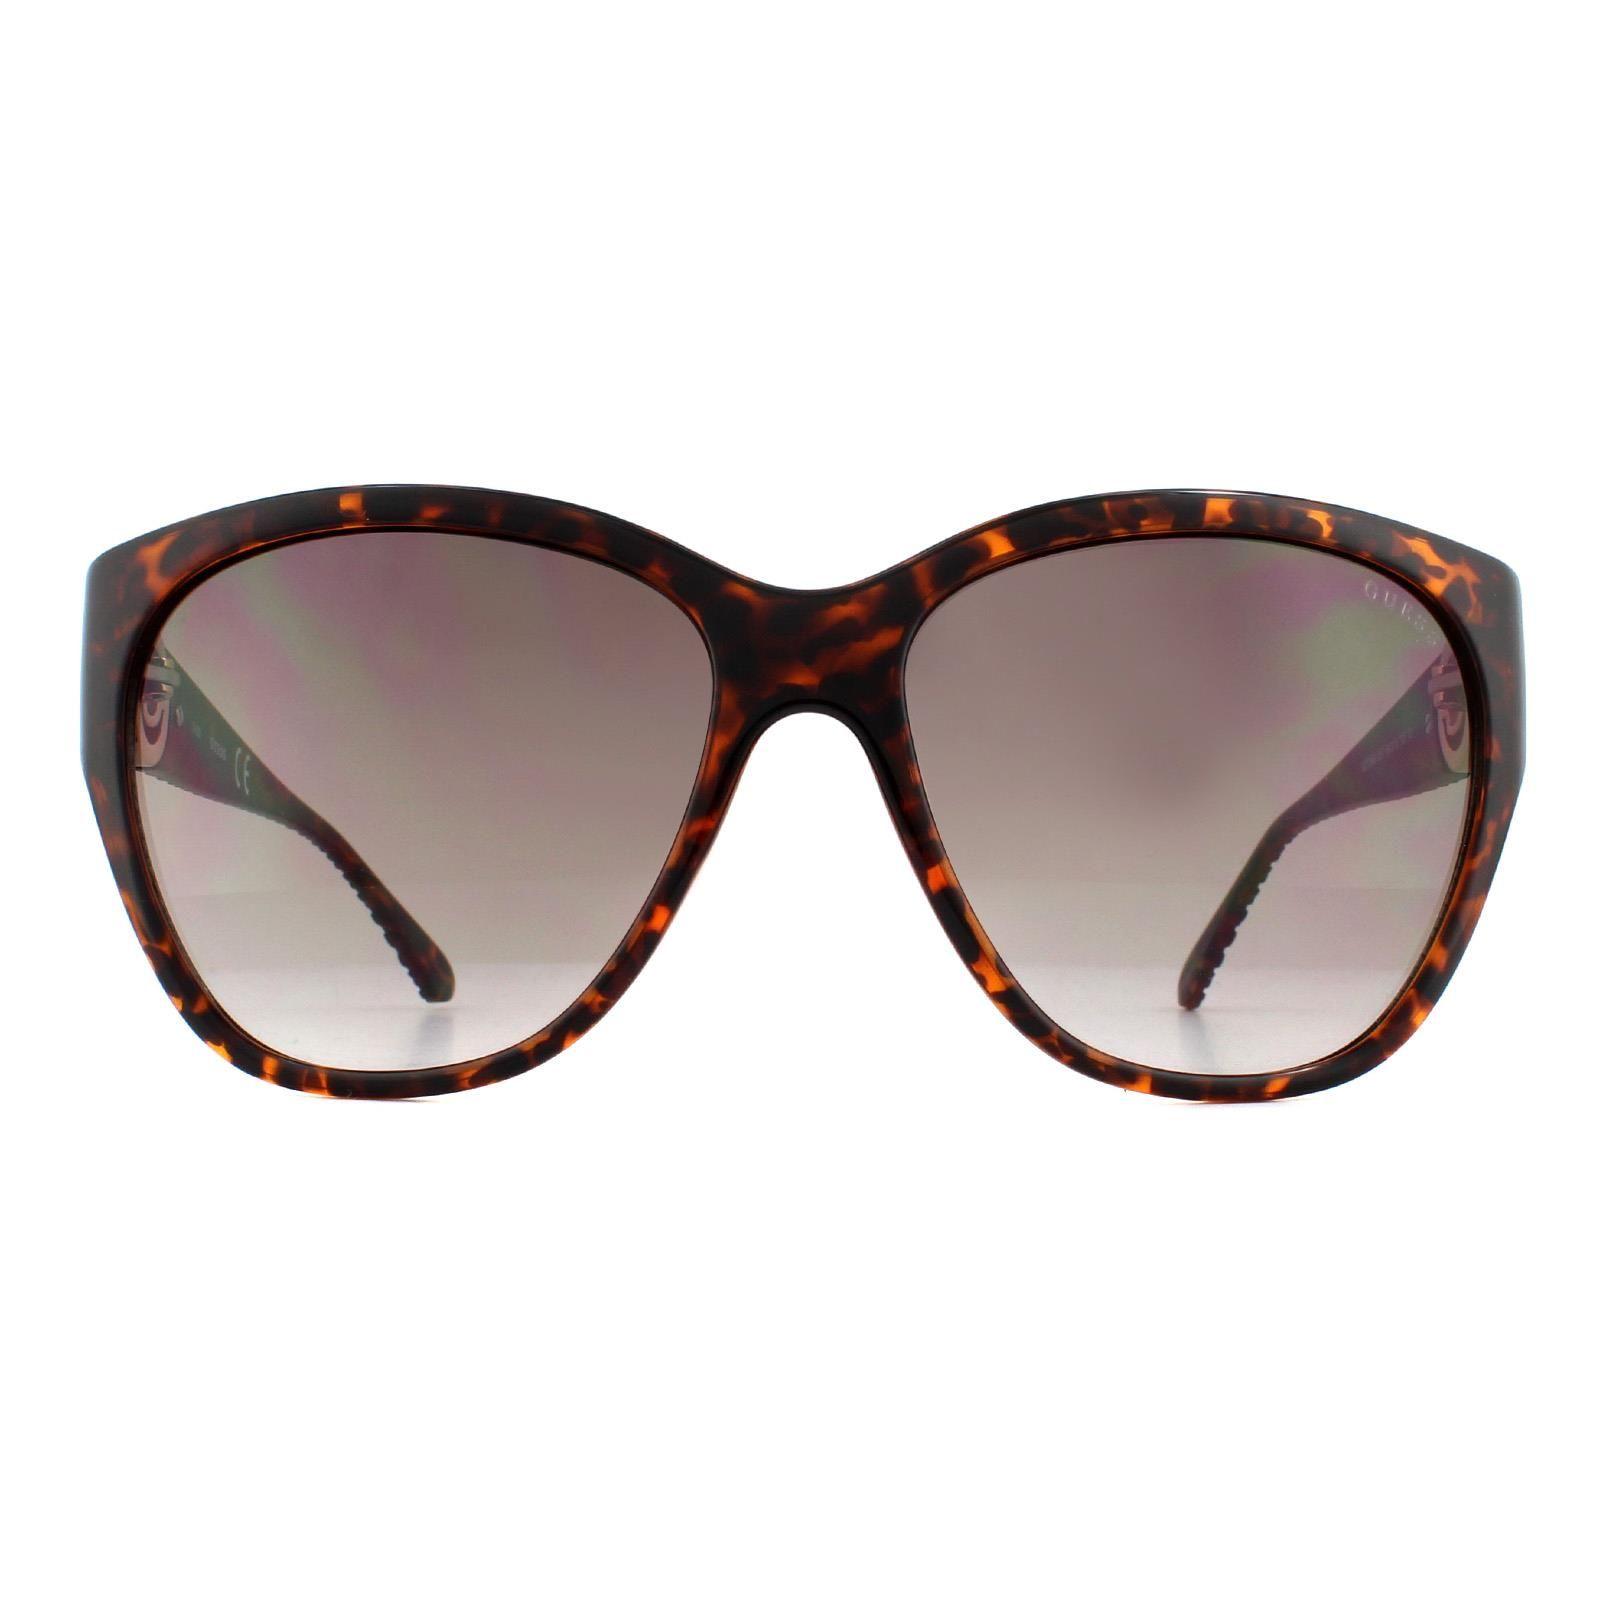 Guess Sunglasses GU7348 S57 Dark Havana Brown Gradient